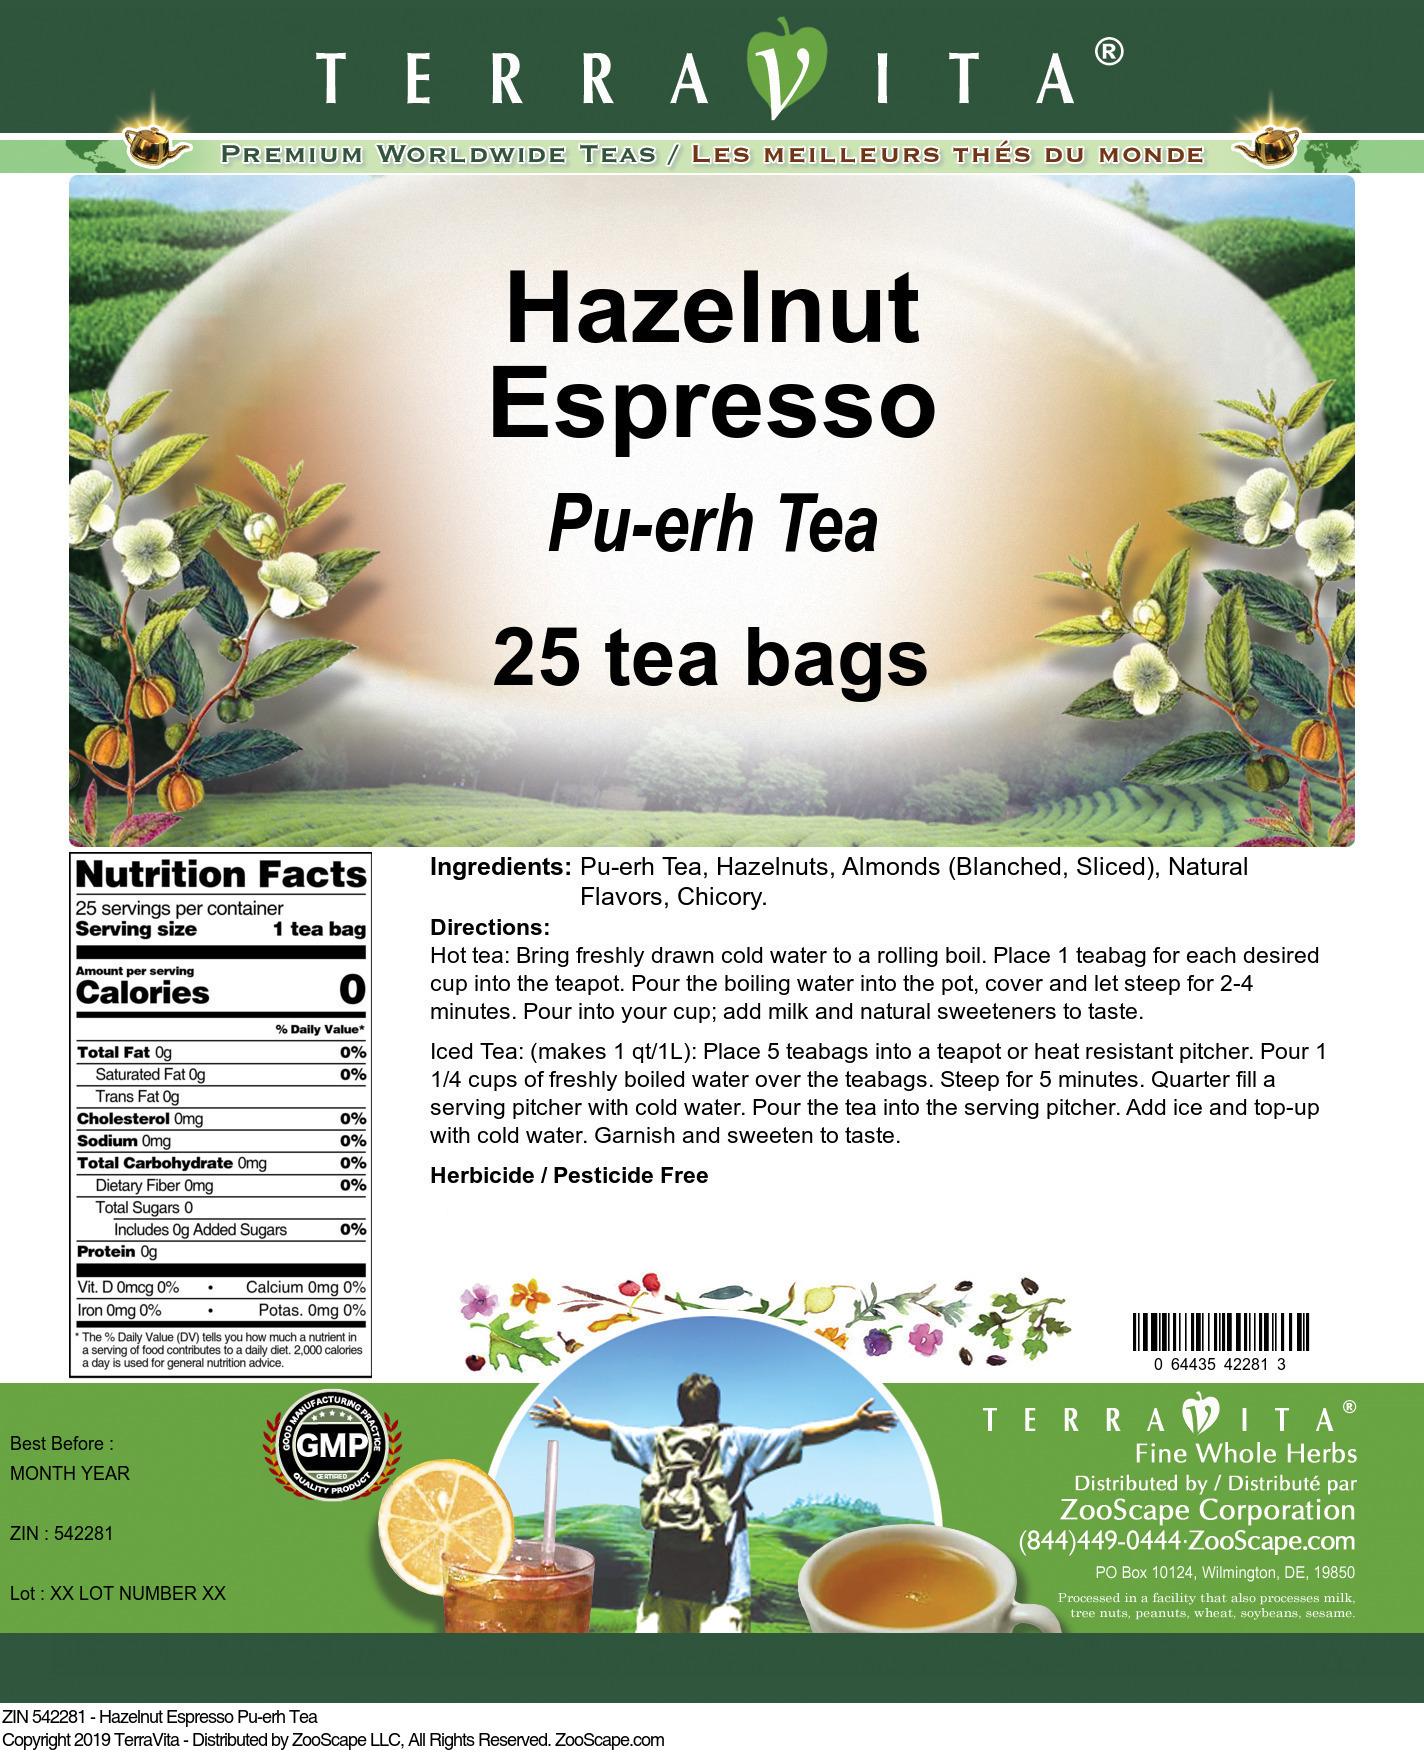 Hazelnut Espresso Pu-erh Tea